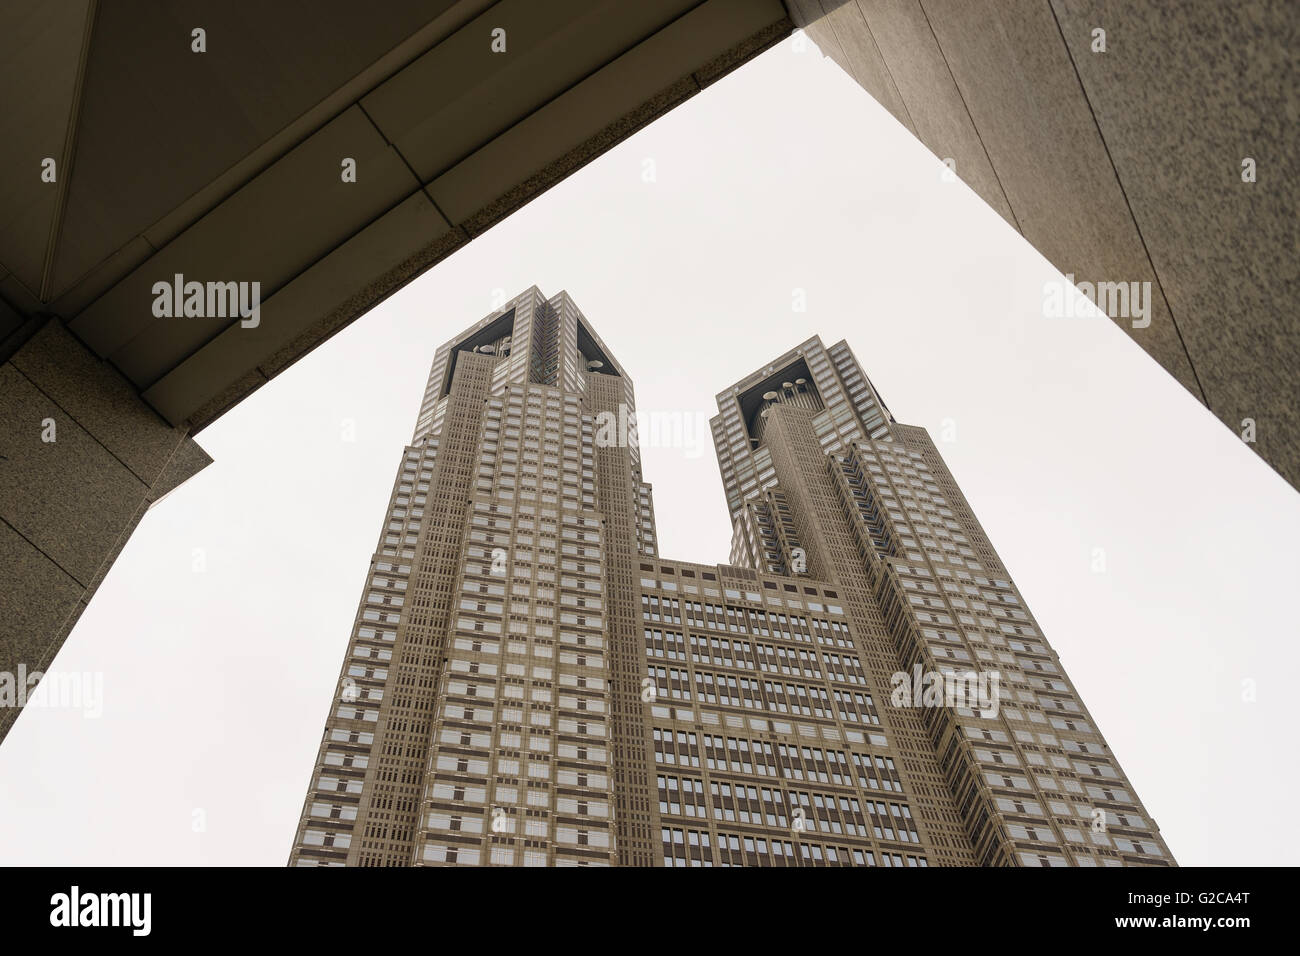 Das Tokyo Metropolitan Government Building, Shinjuku, Tokio, Japan. Stockbild